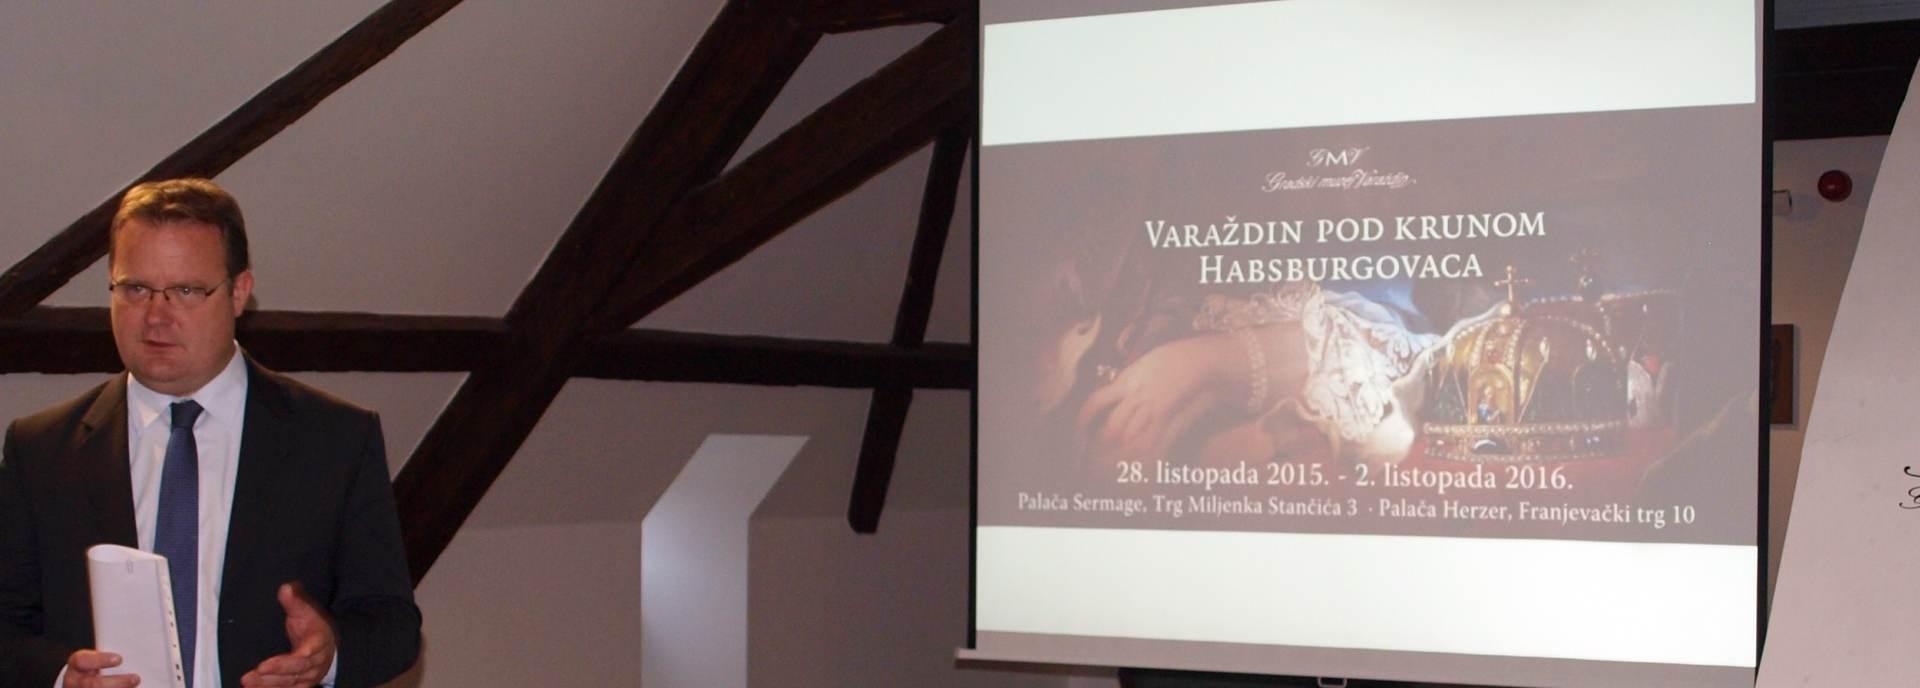 "Izložbom ""Varaždin pod krunom Habsburgovaca"" Gradski muzej slavi 90. obljetnicu"